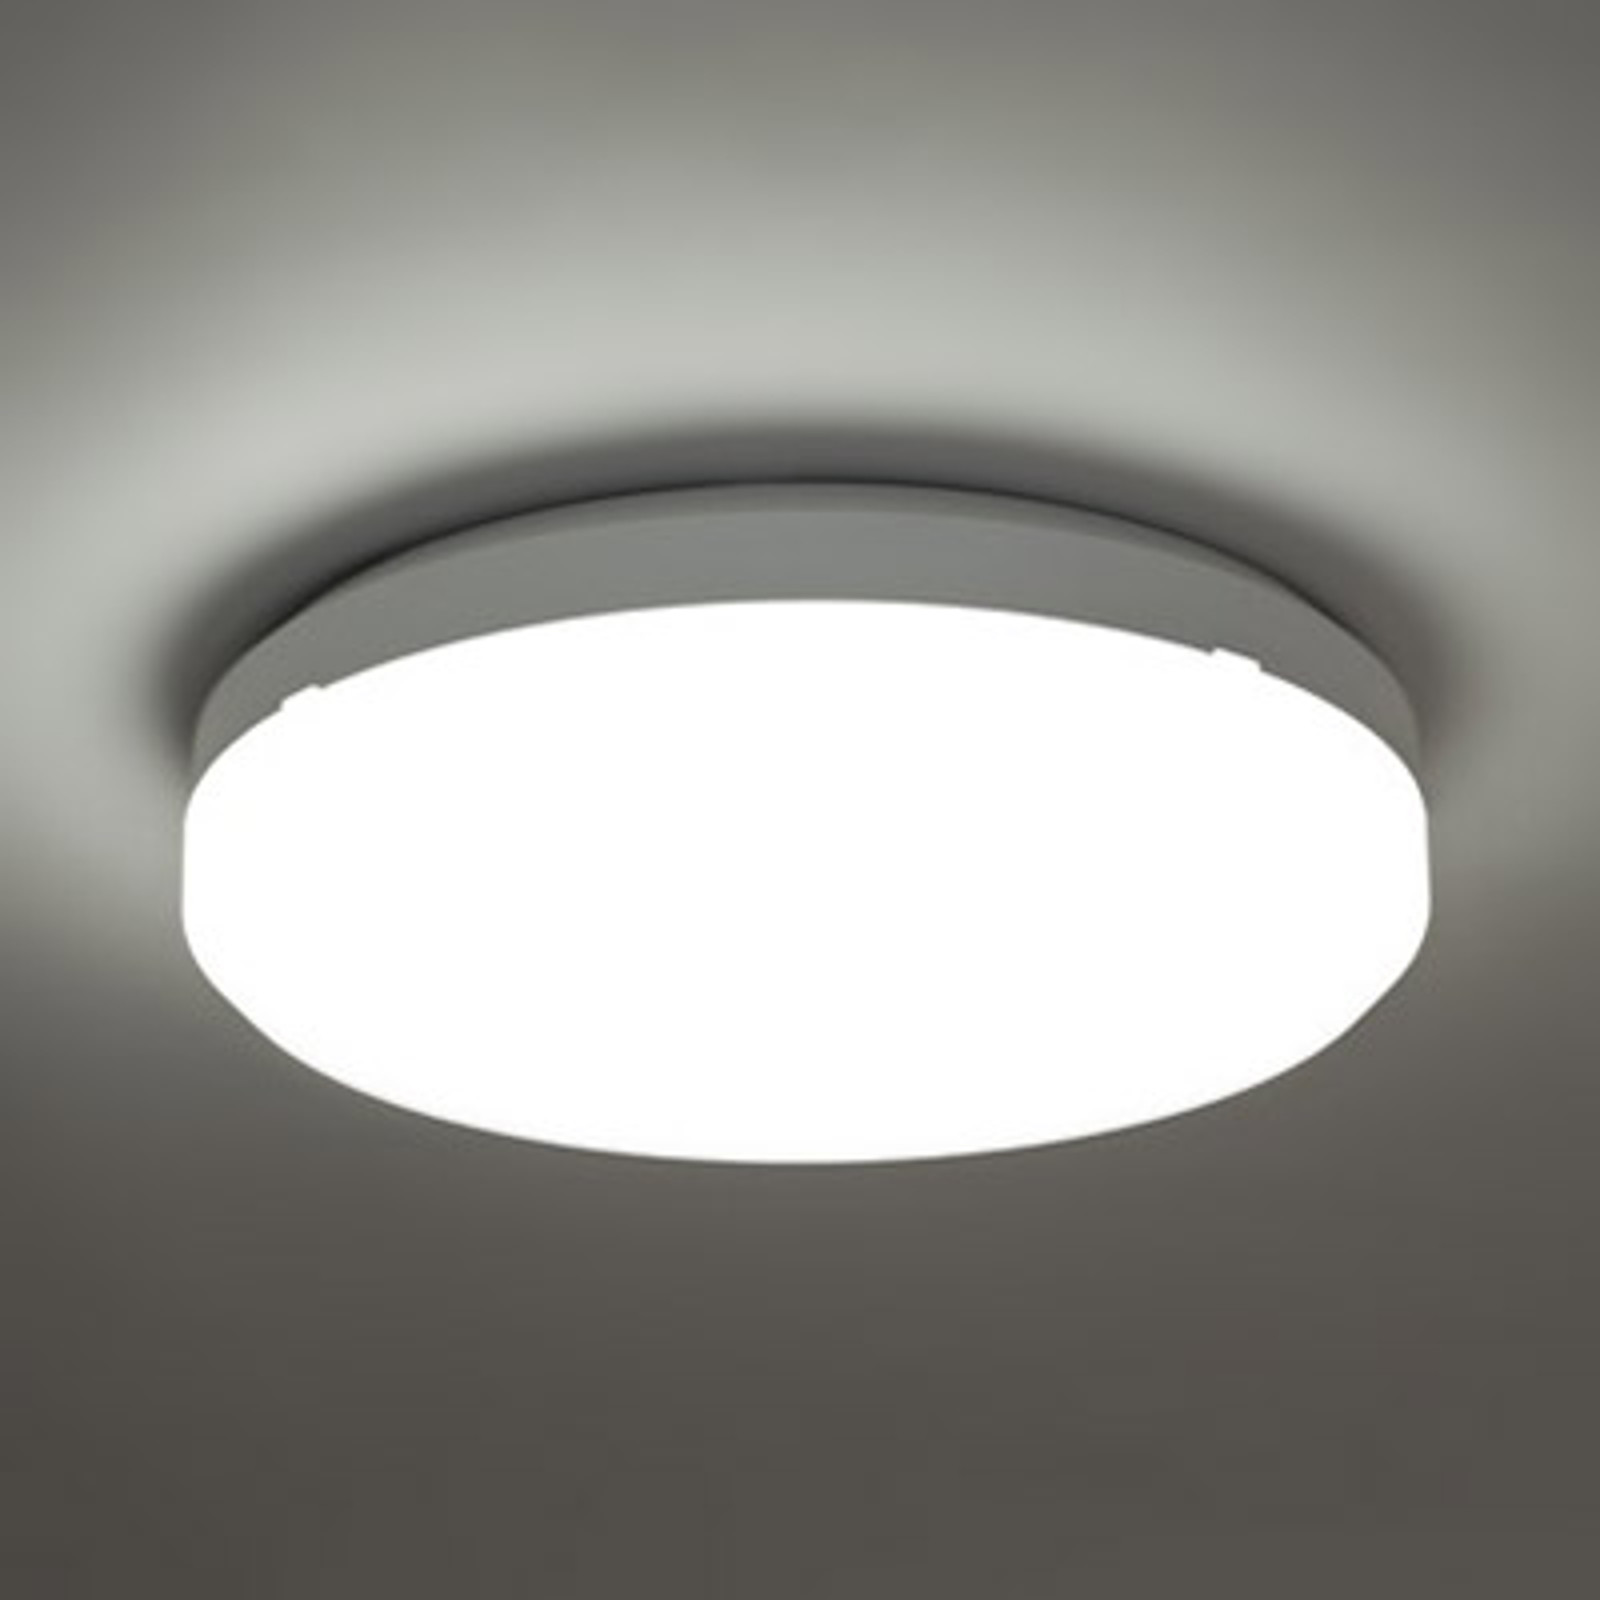 SUN 15 LED-loftlampe IP65 26W 4000 K universalhvid